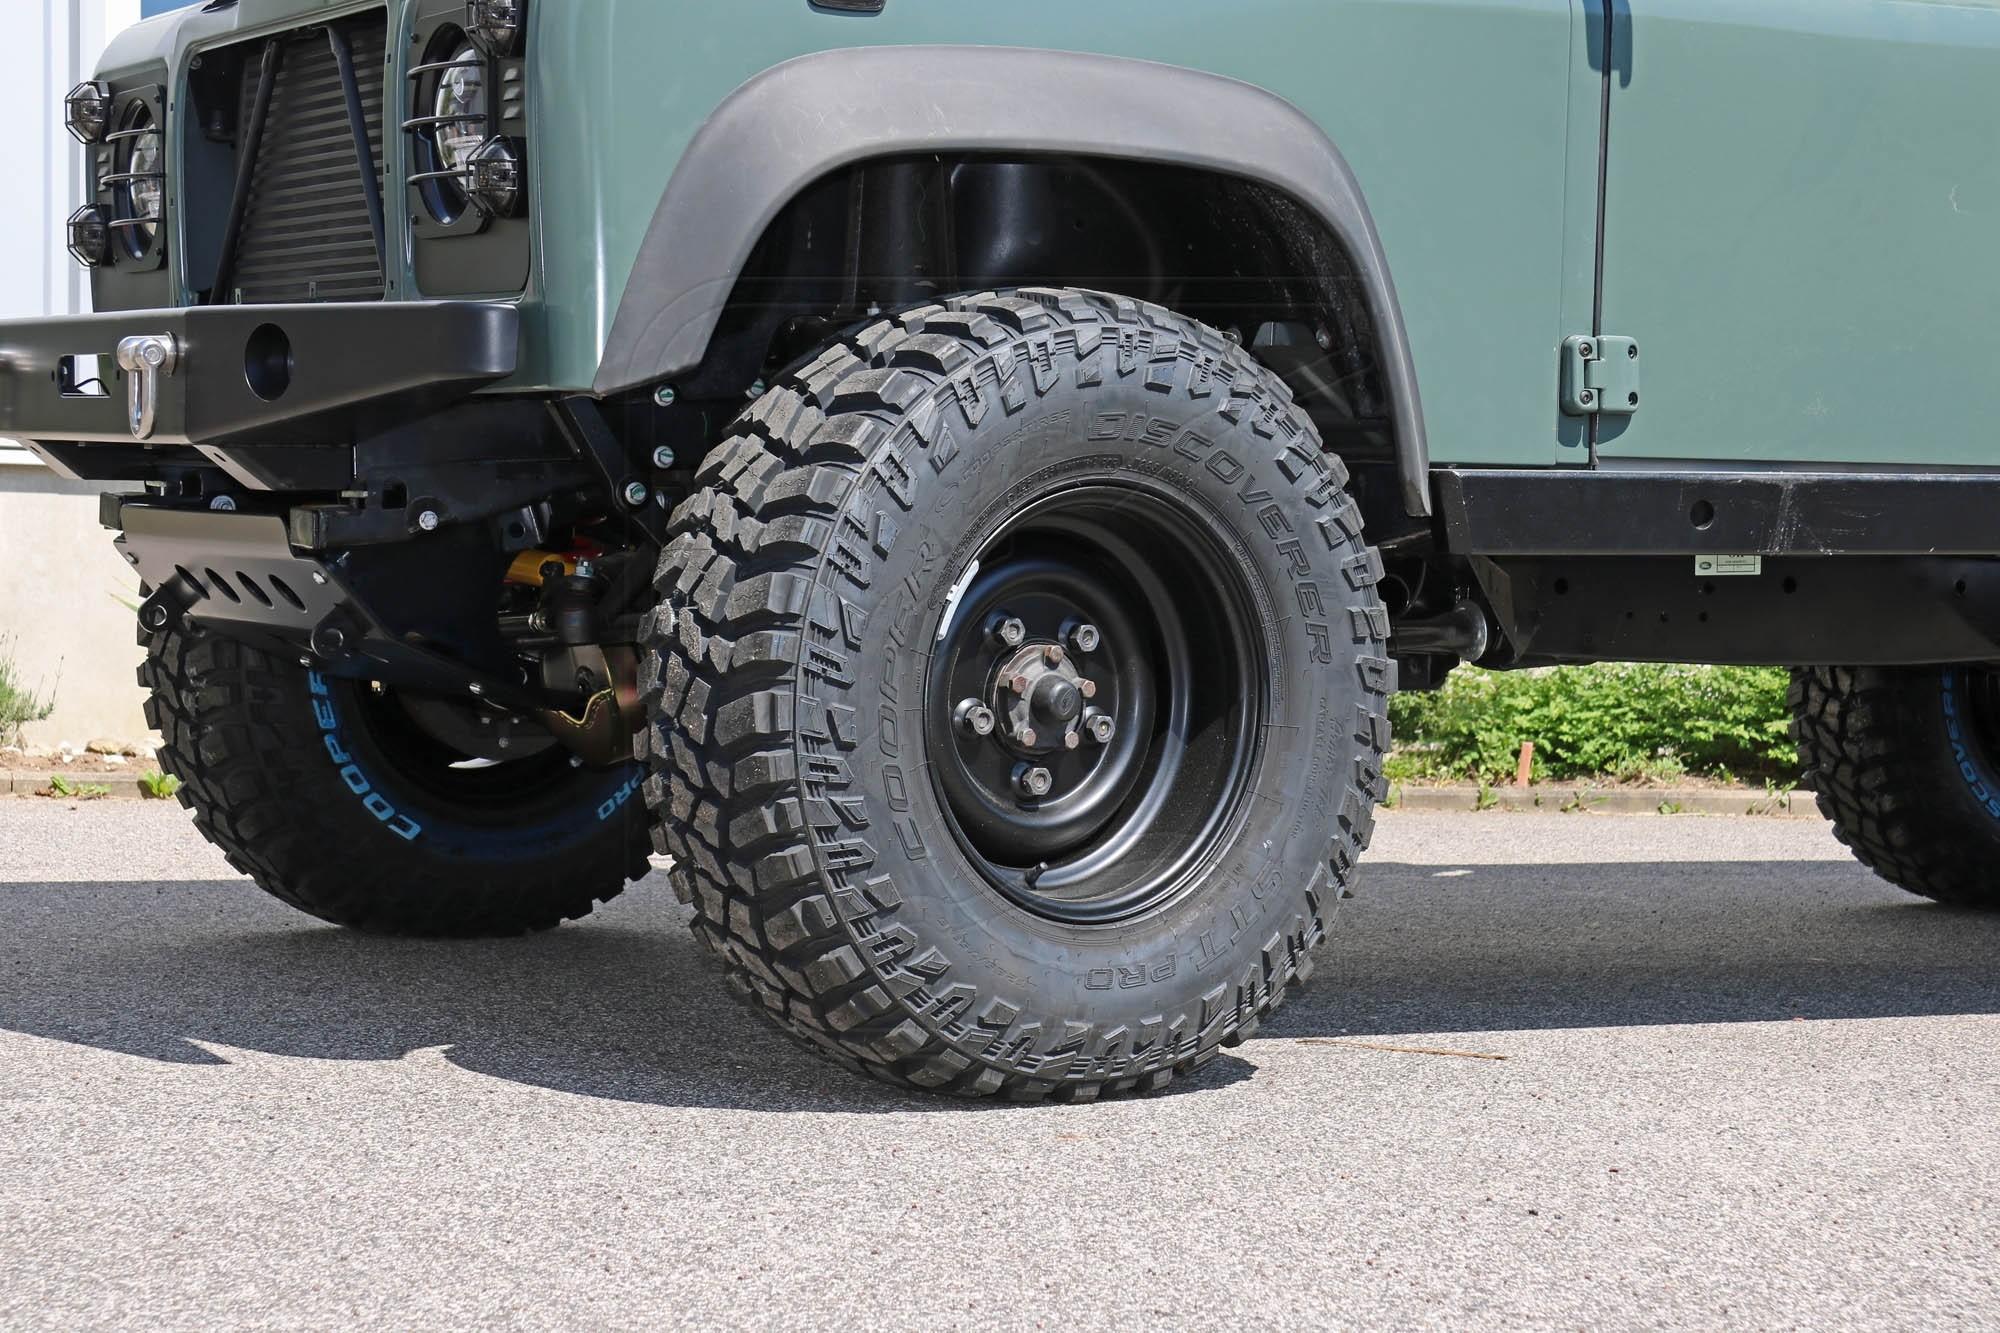 "Nakatanenga ANR CLASSIC Steel wheel 8x16"" for Land Rover Defender"